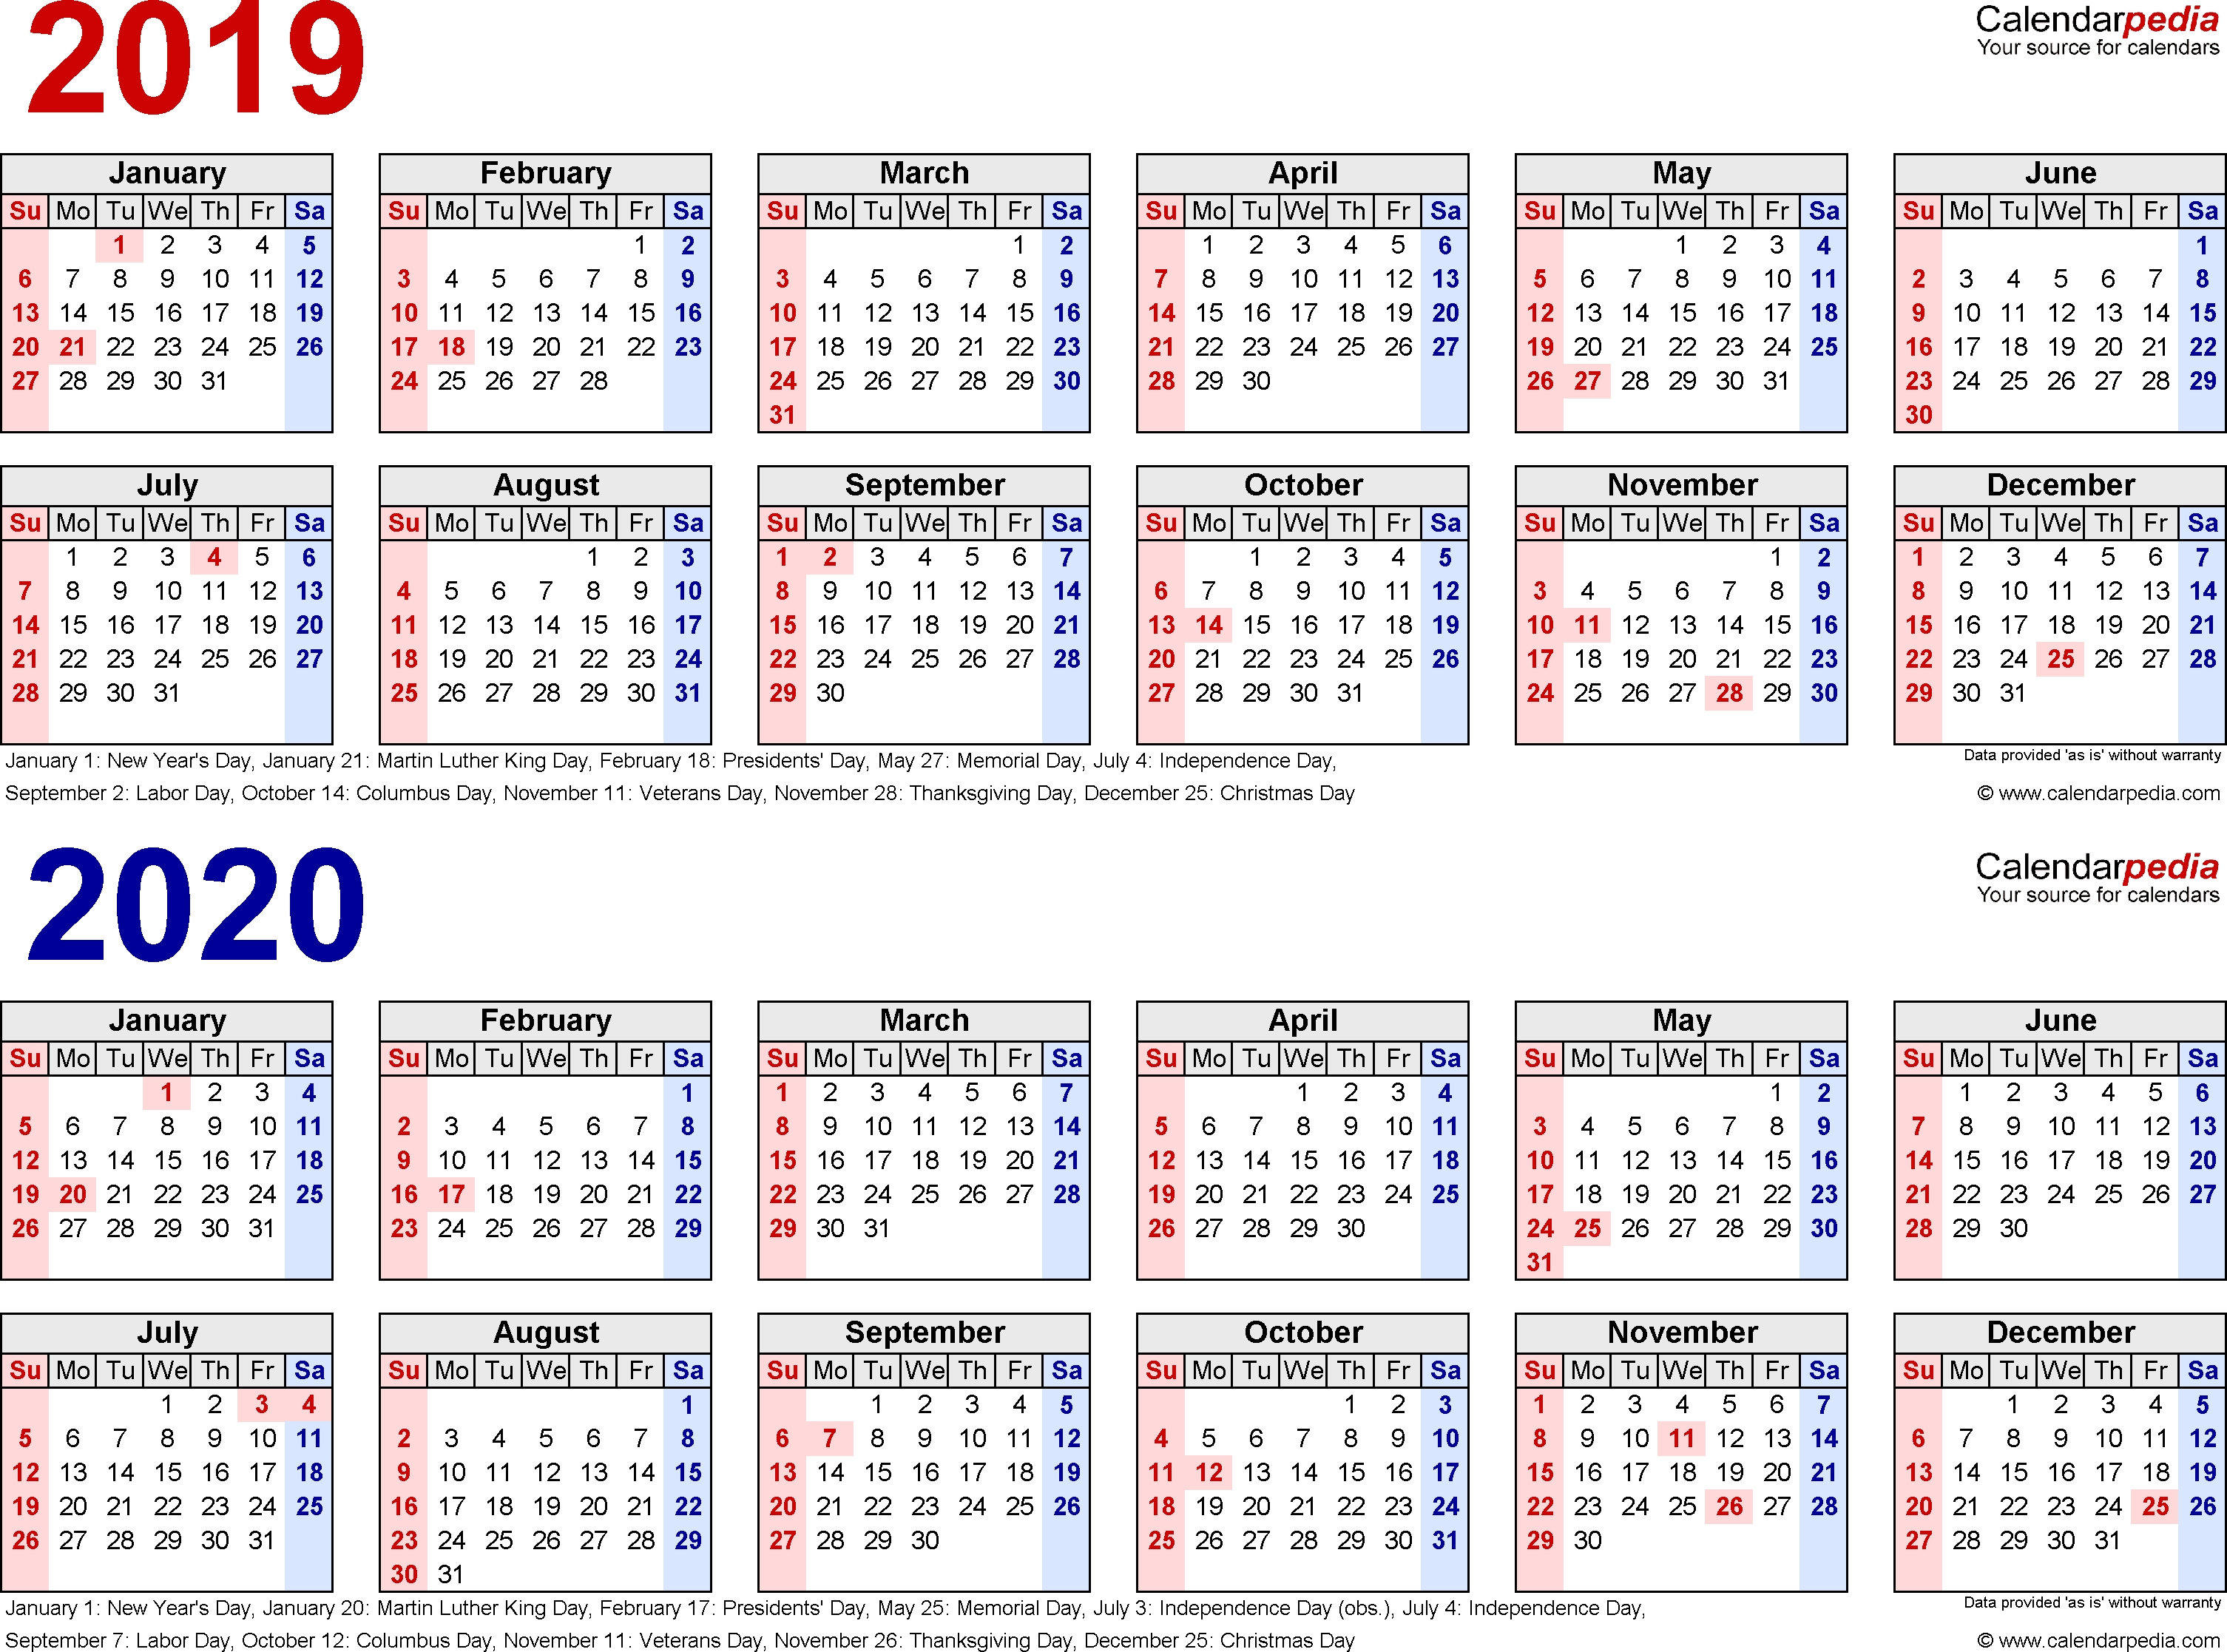 2019-2020 Calendar - Free Printable Two-Year Pdf Calendars inside Year Long Calendar 2019- 2020 Printable